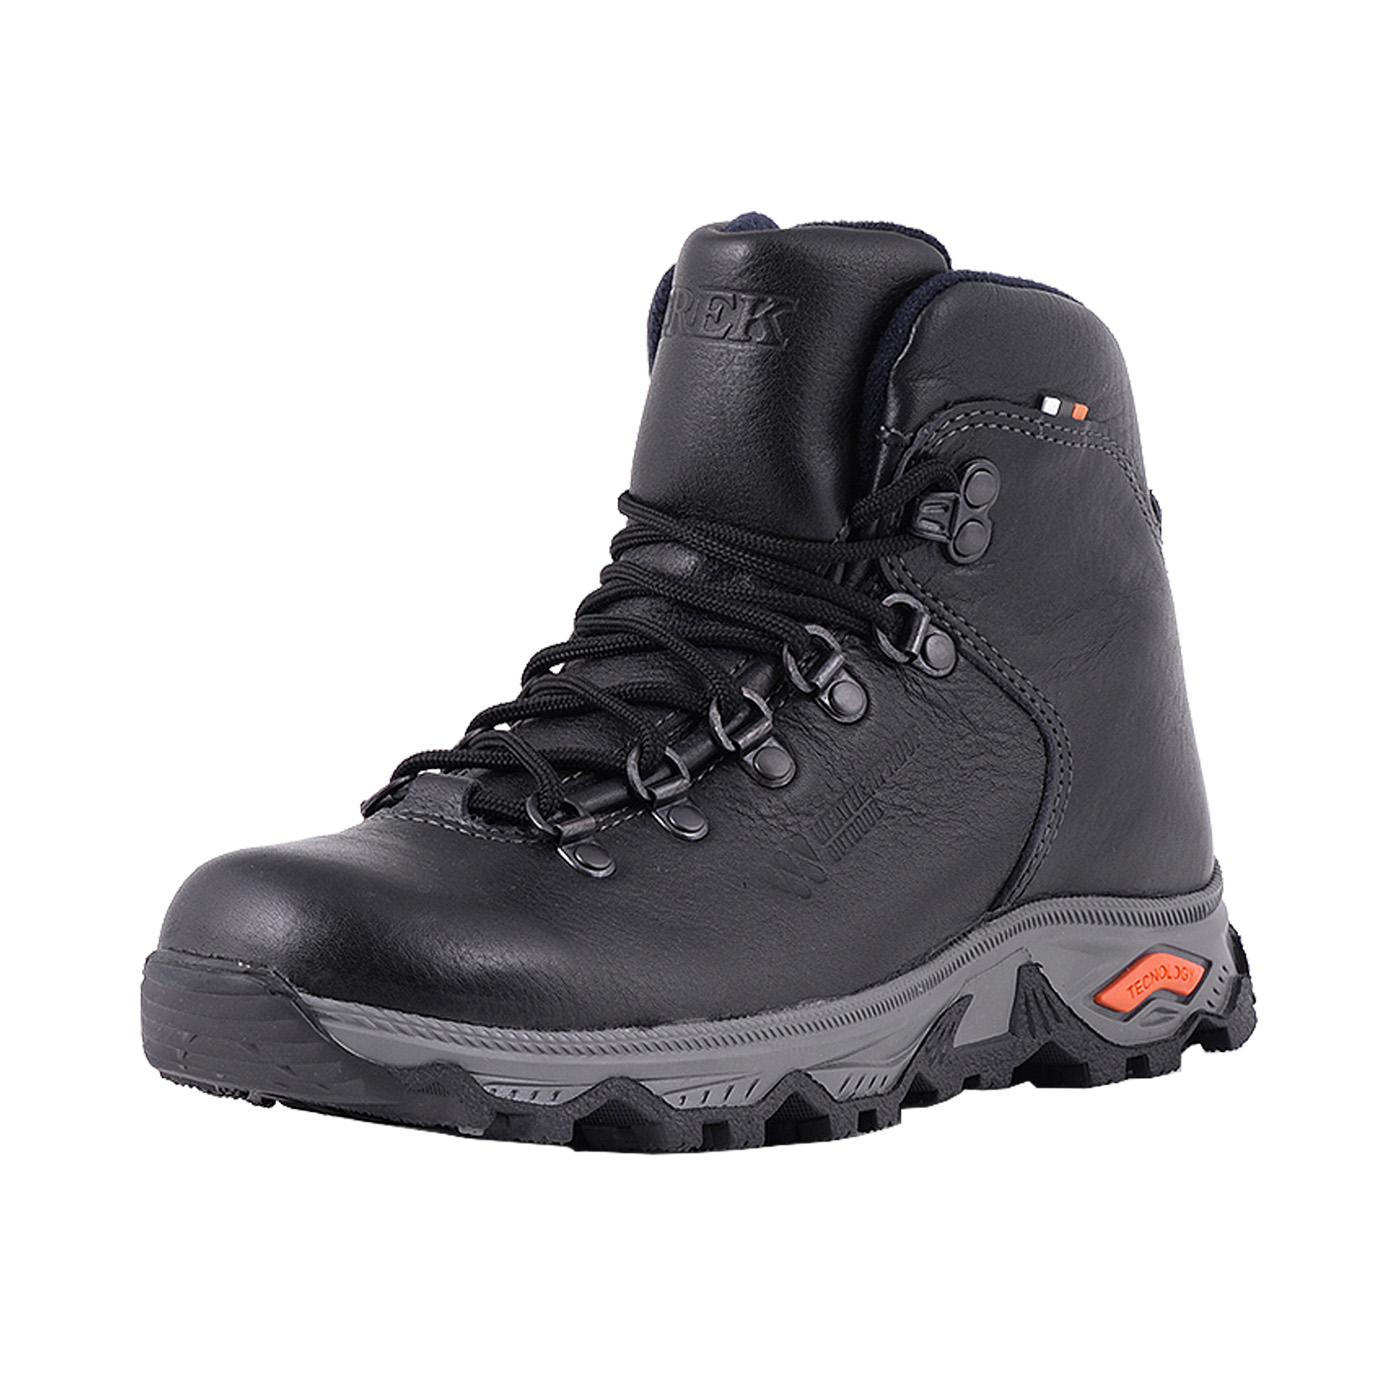 Ботинки мужские TREK Hiking18 (капровелюр), Ботинки - арт. 1129440177